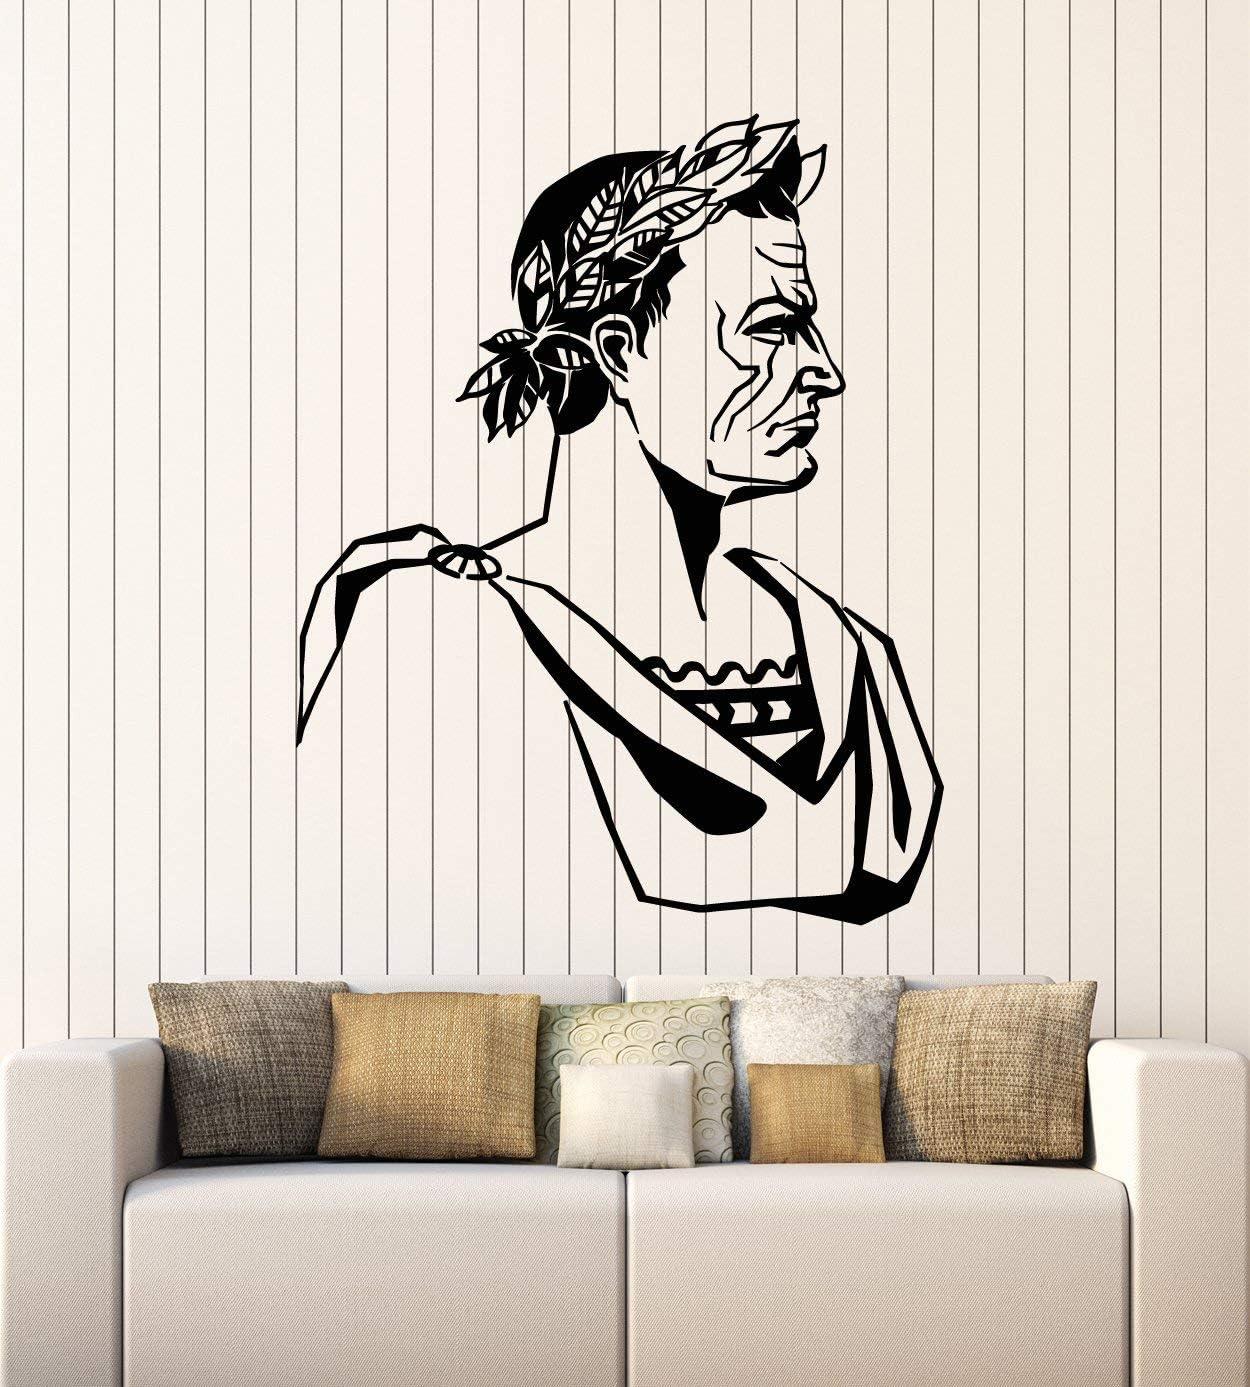 Vinyl Wall Decal Julius Caesar Ancient Rome Roman Empire Stickers Mural Large Decor (g2407) Black